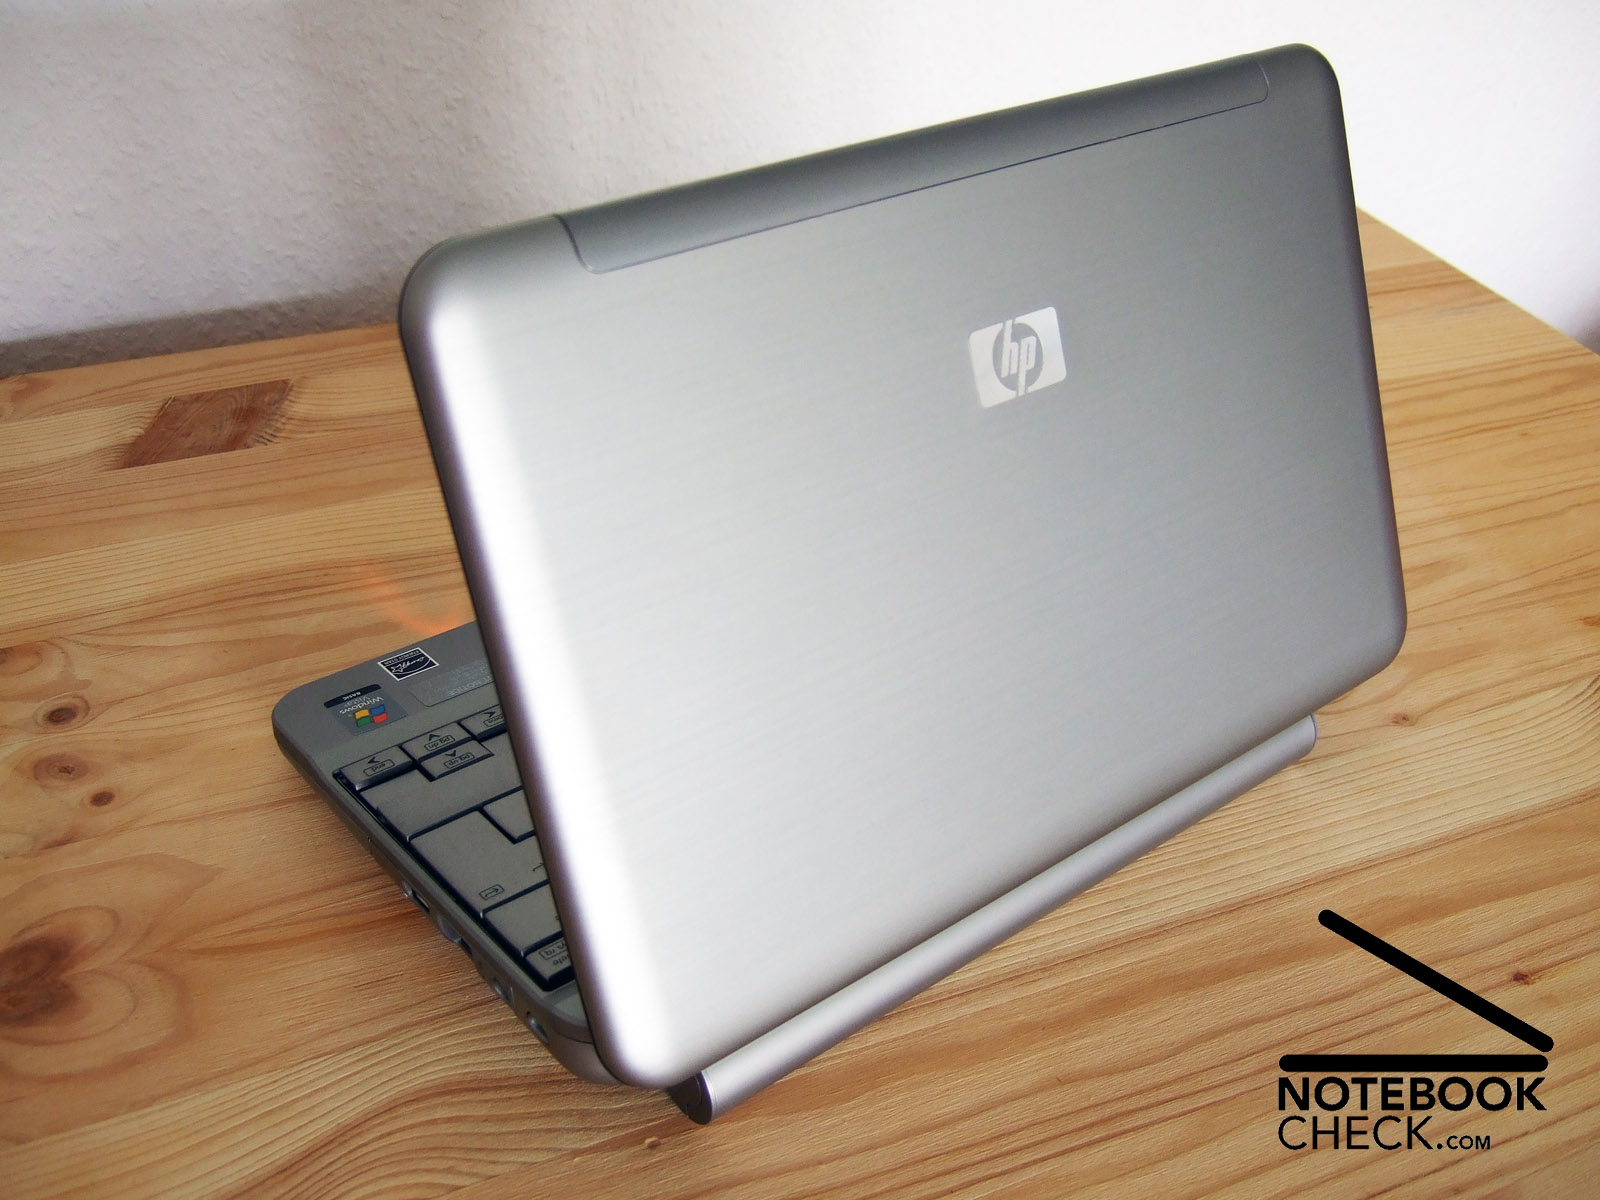 HP 2133 Mini-Note Broadcom Wireless Drivers for Windows Download